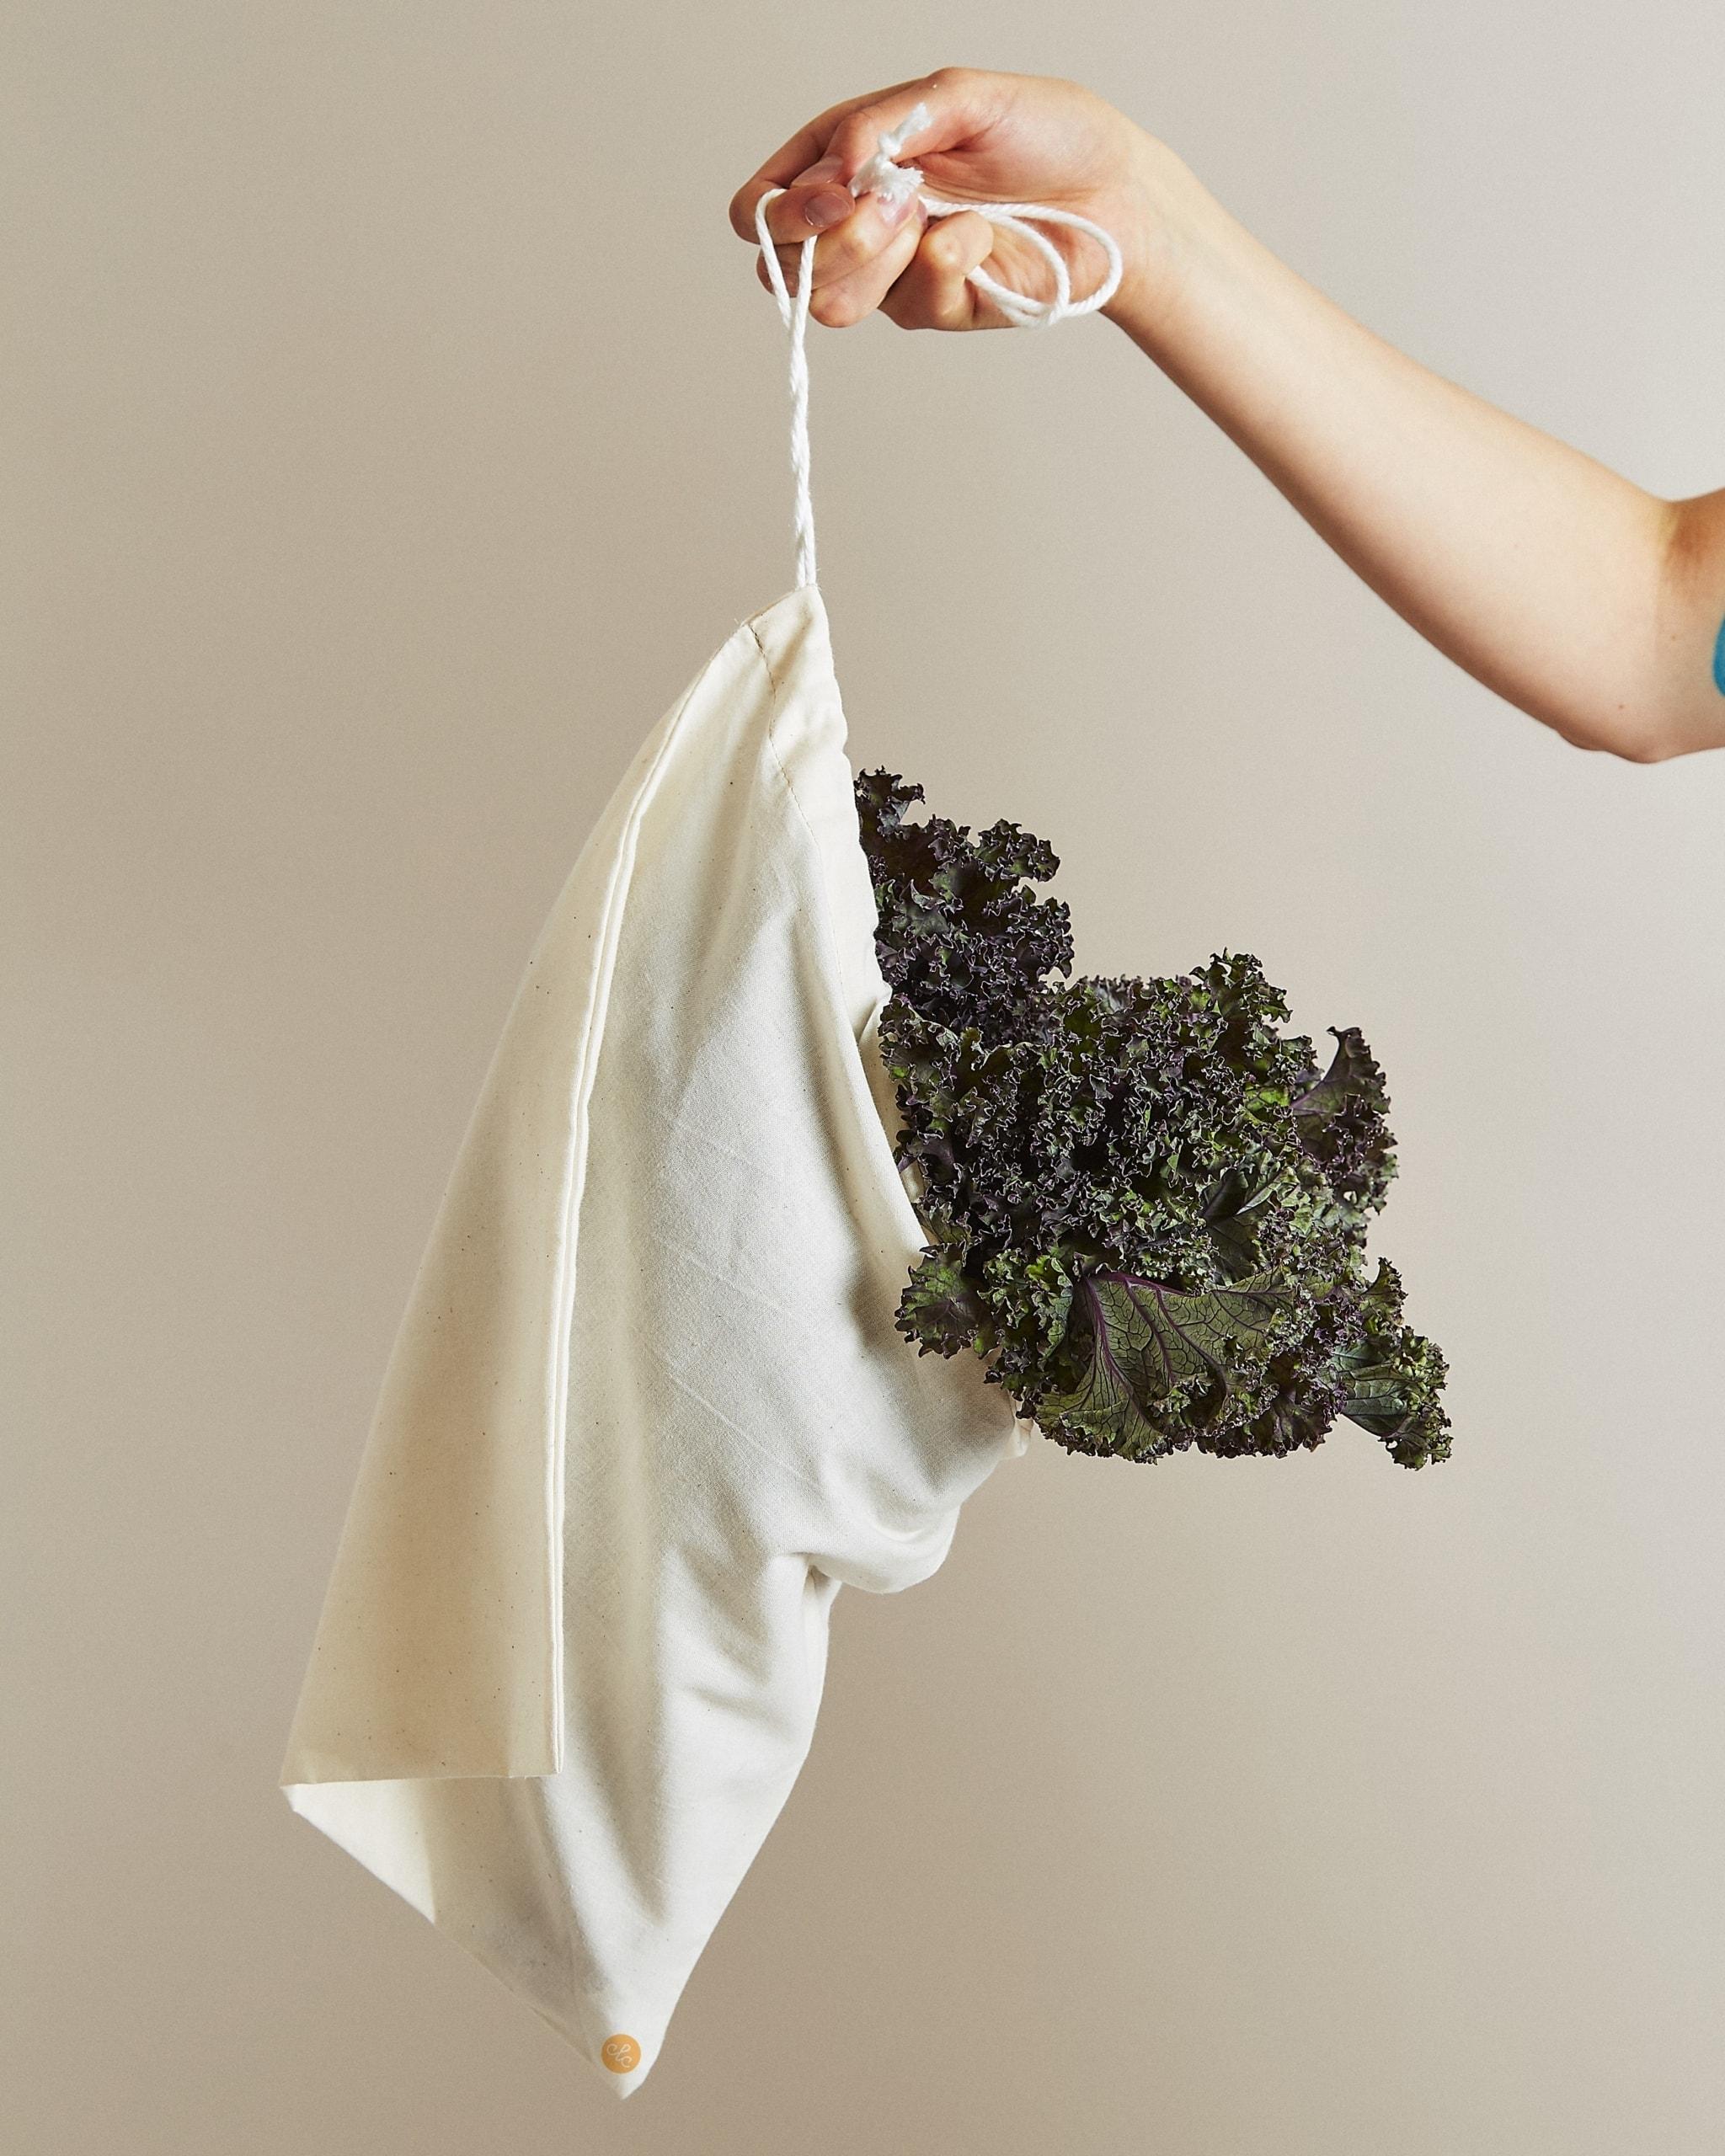 cotton drawstring produce bag